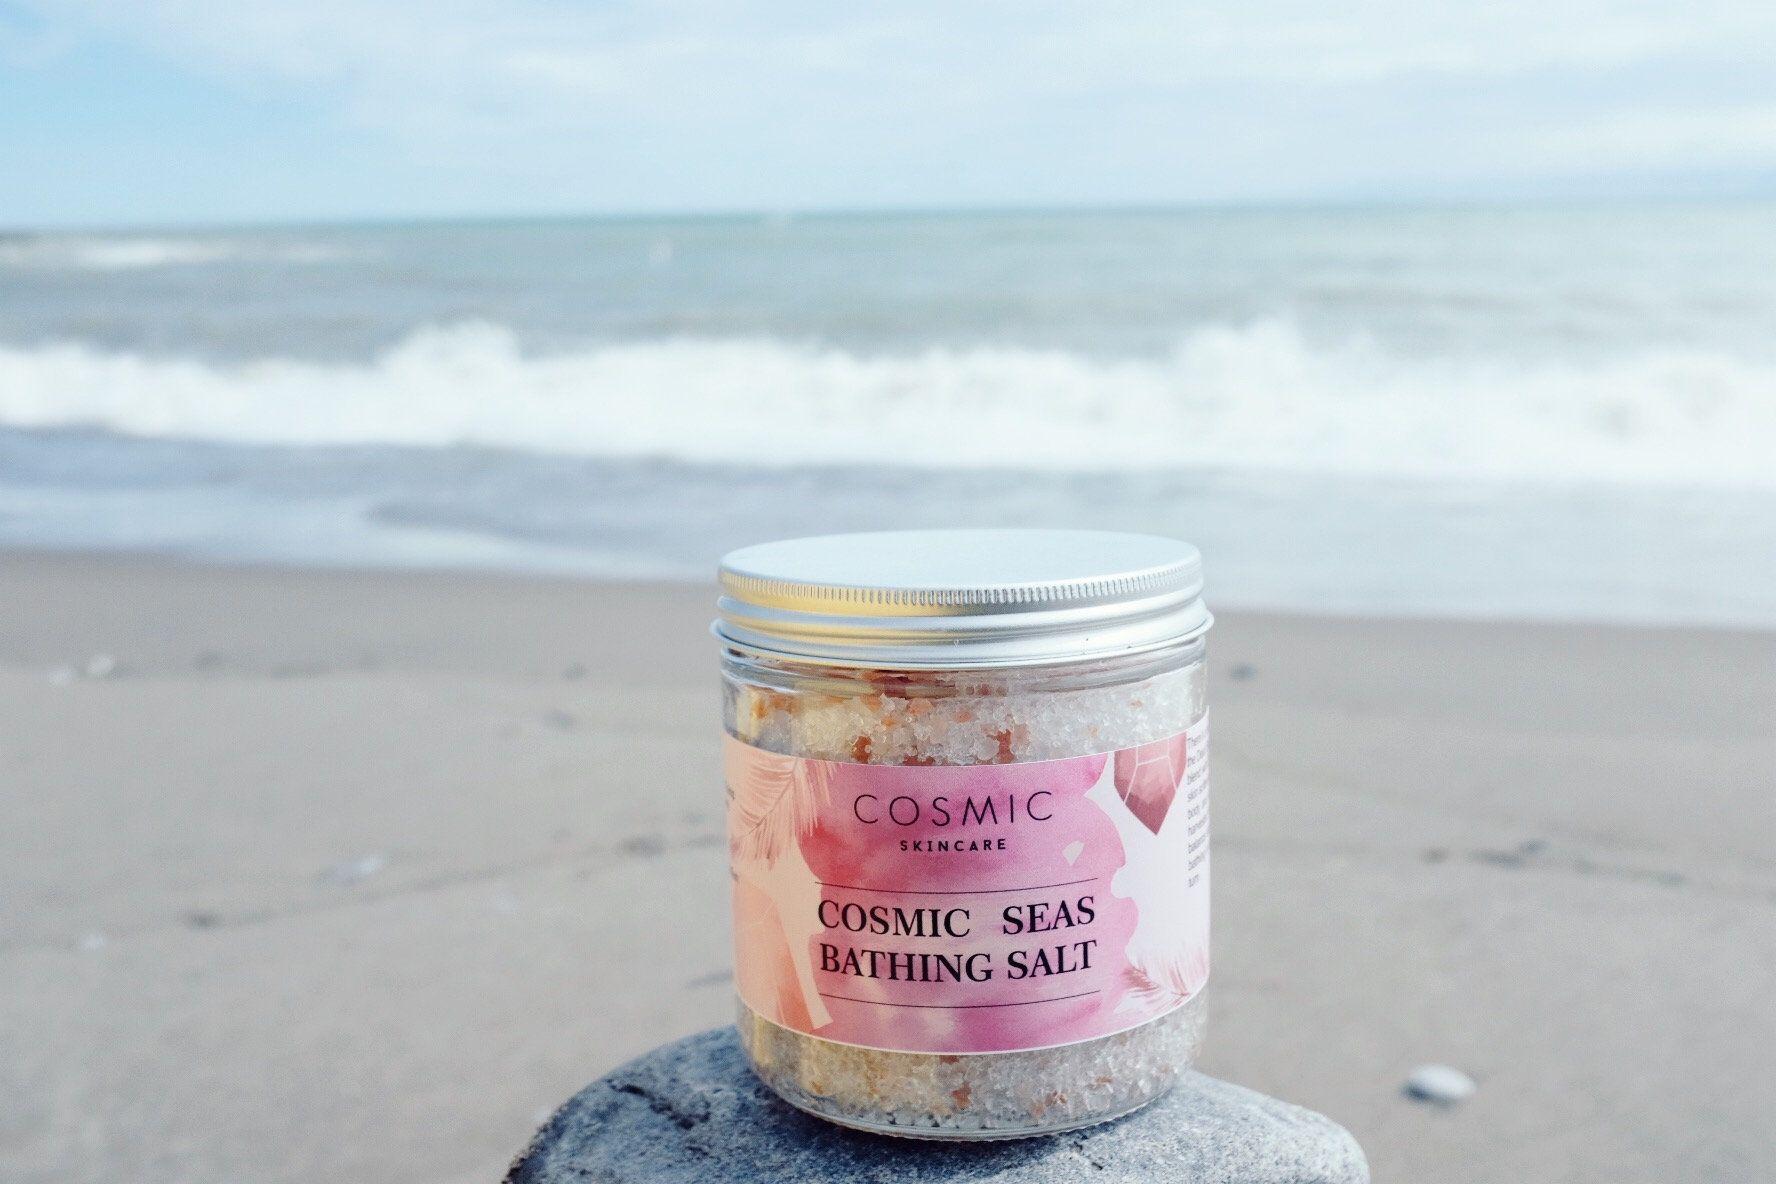 Epsom Salt Bath For Eczema Is It Good How To Use It Epsom Salt Bath Eczema Atopic Dermatitis Treatment